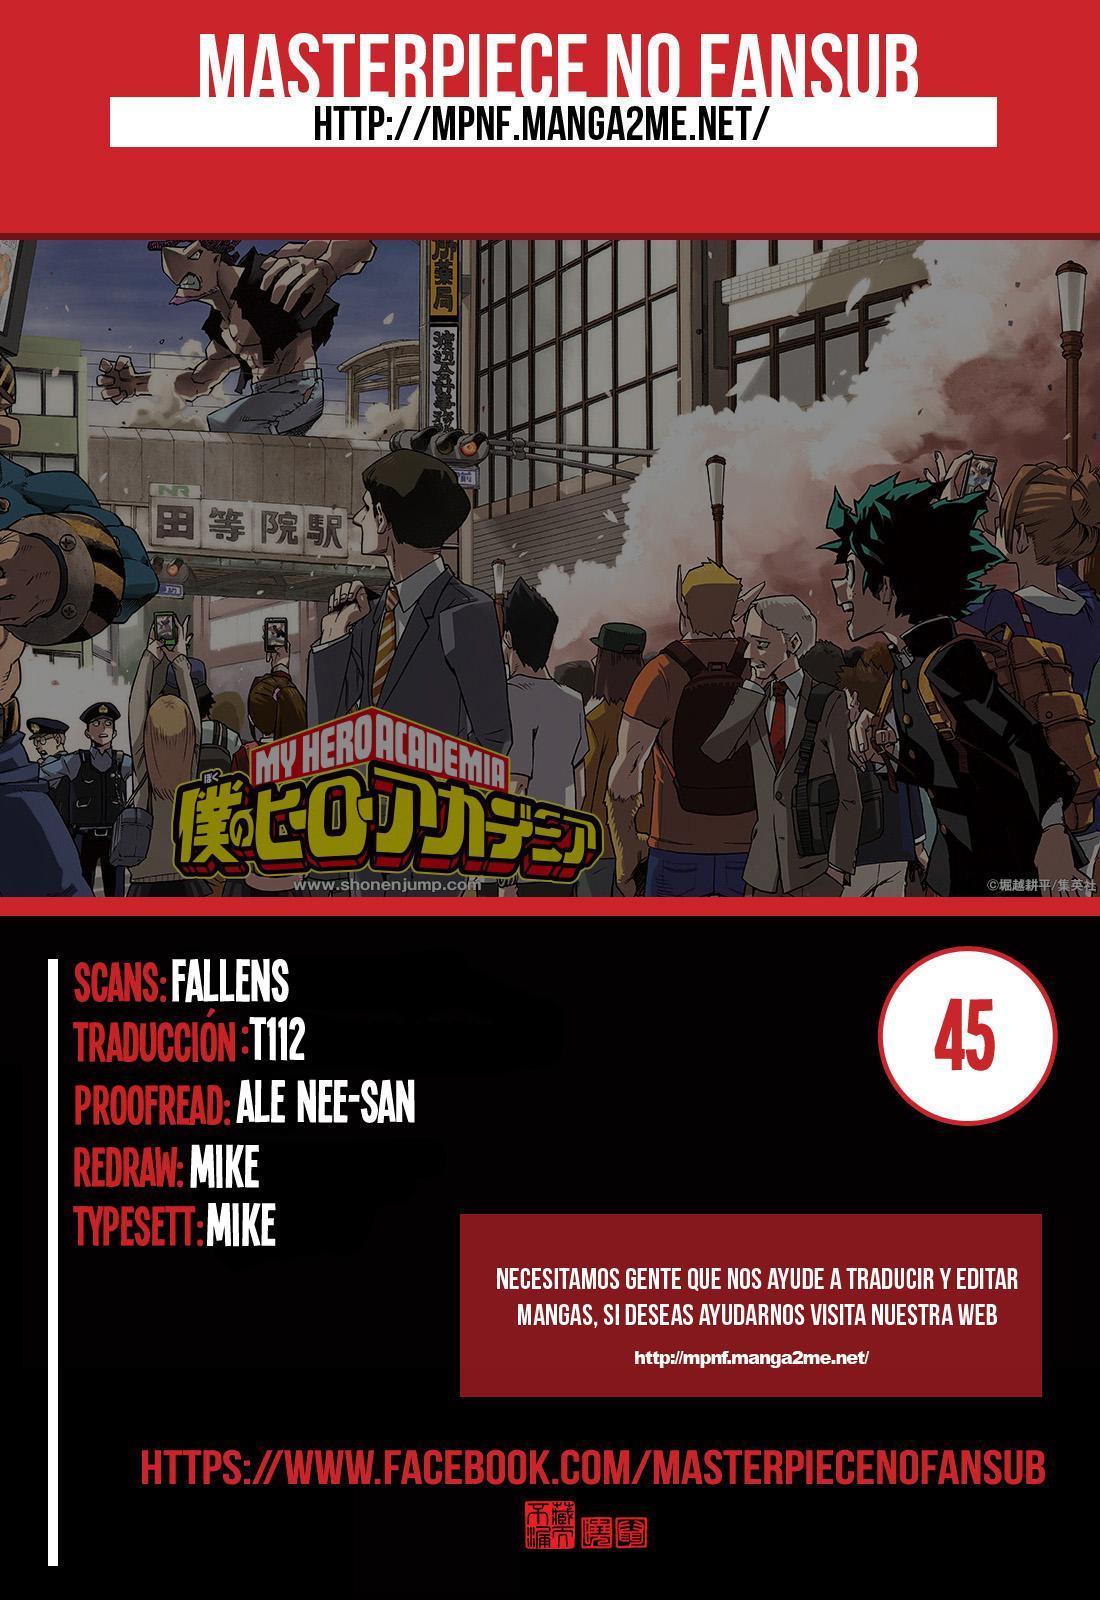 http://c5.ninemanga.com/es_manga/54/182/380457/11508effa455449a0d83d9354b6ca67f.jpg Page 1